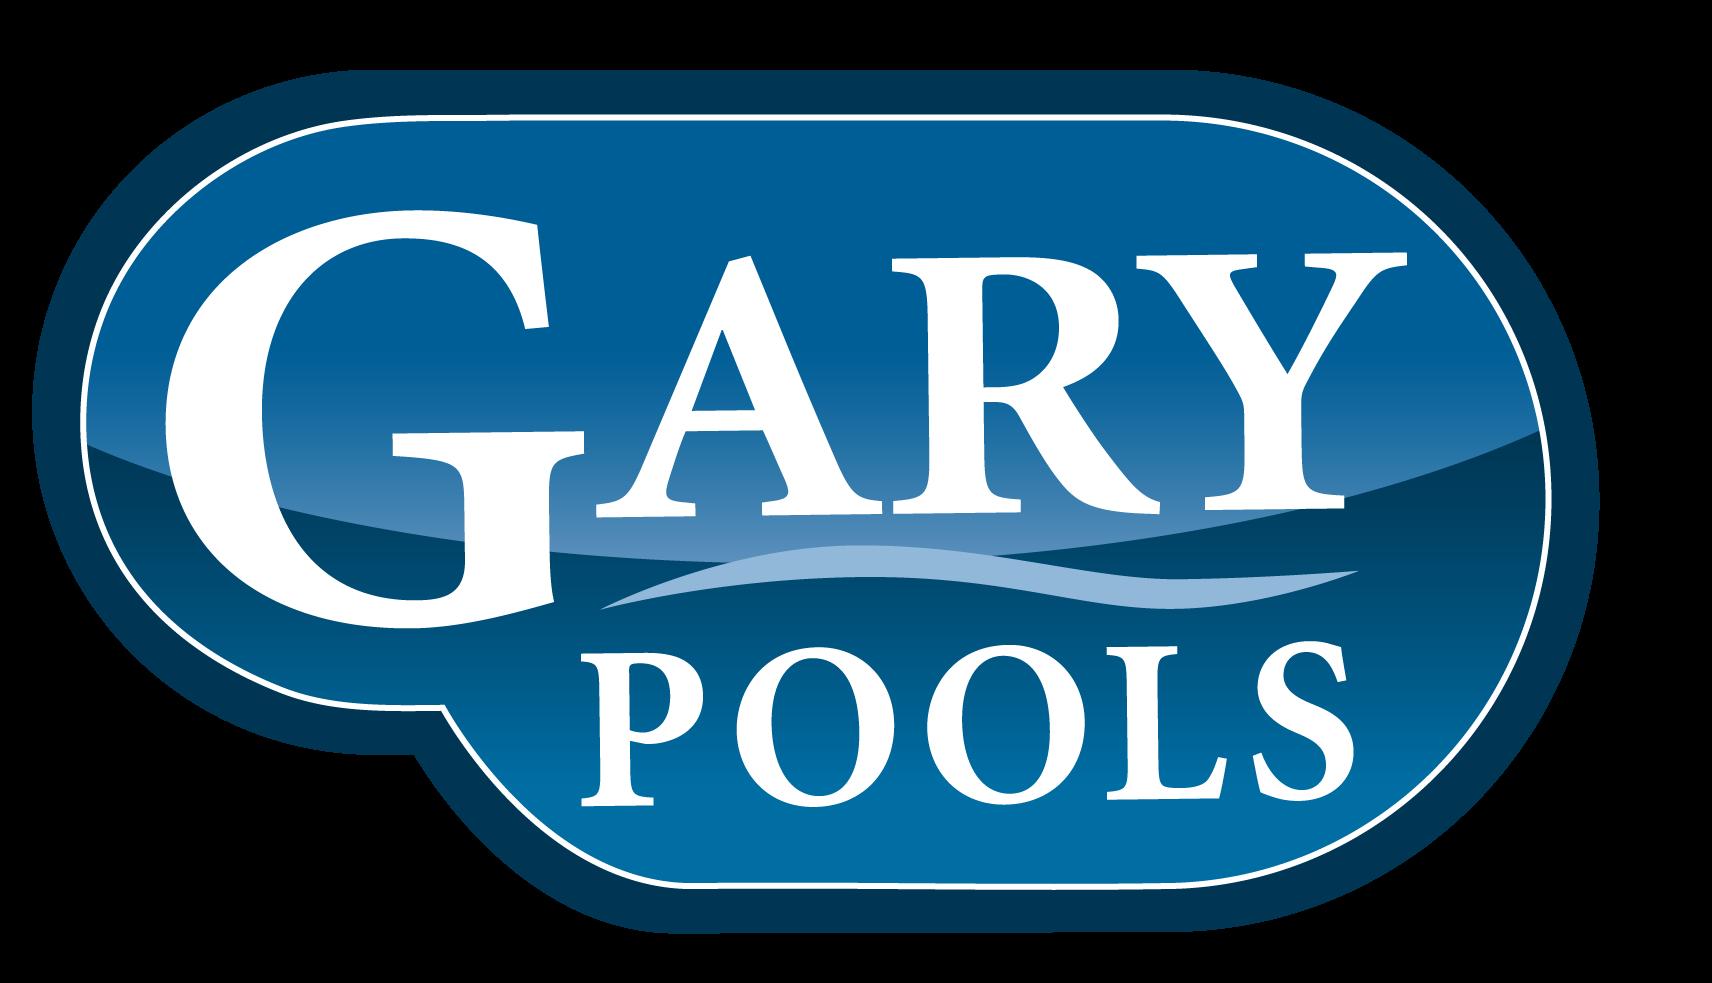 GaryPools_logo updated.png